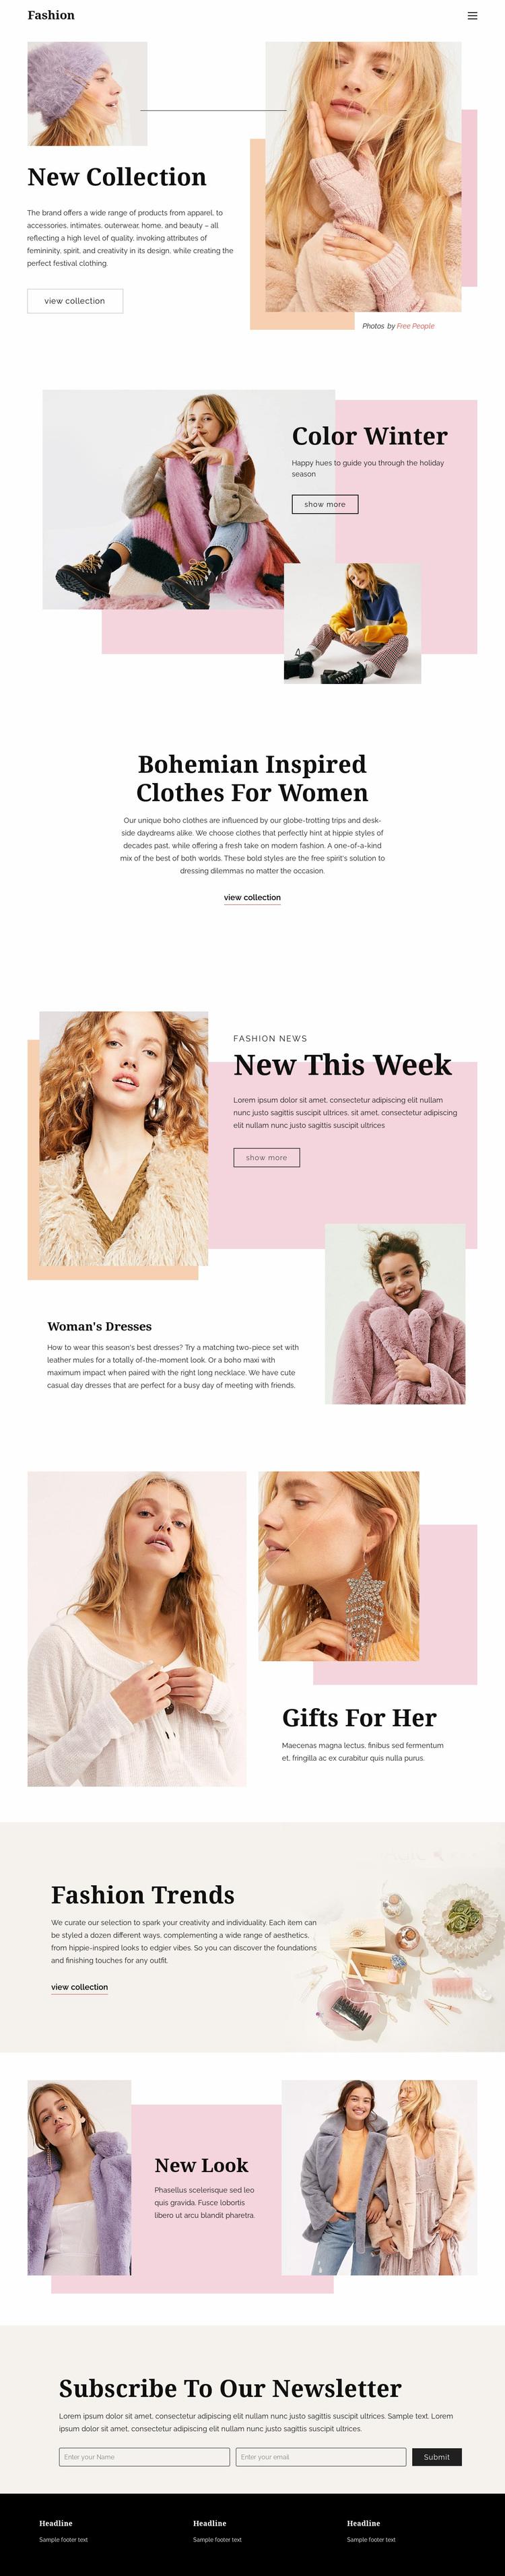 Fashion Page Design Web Page Designer